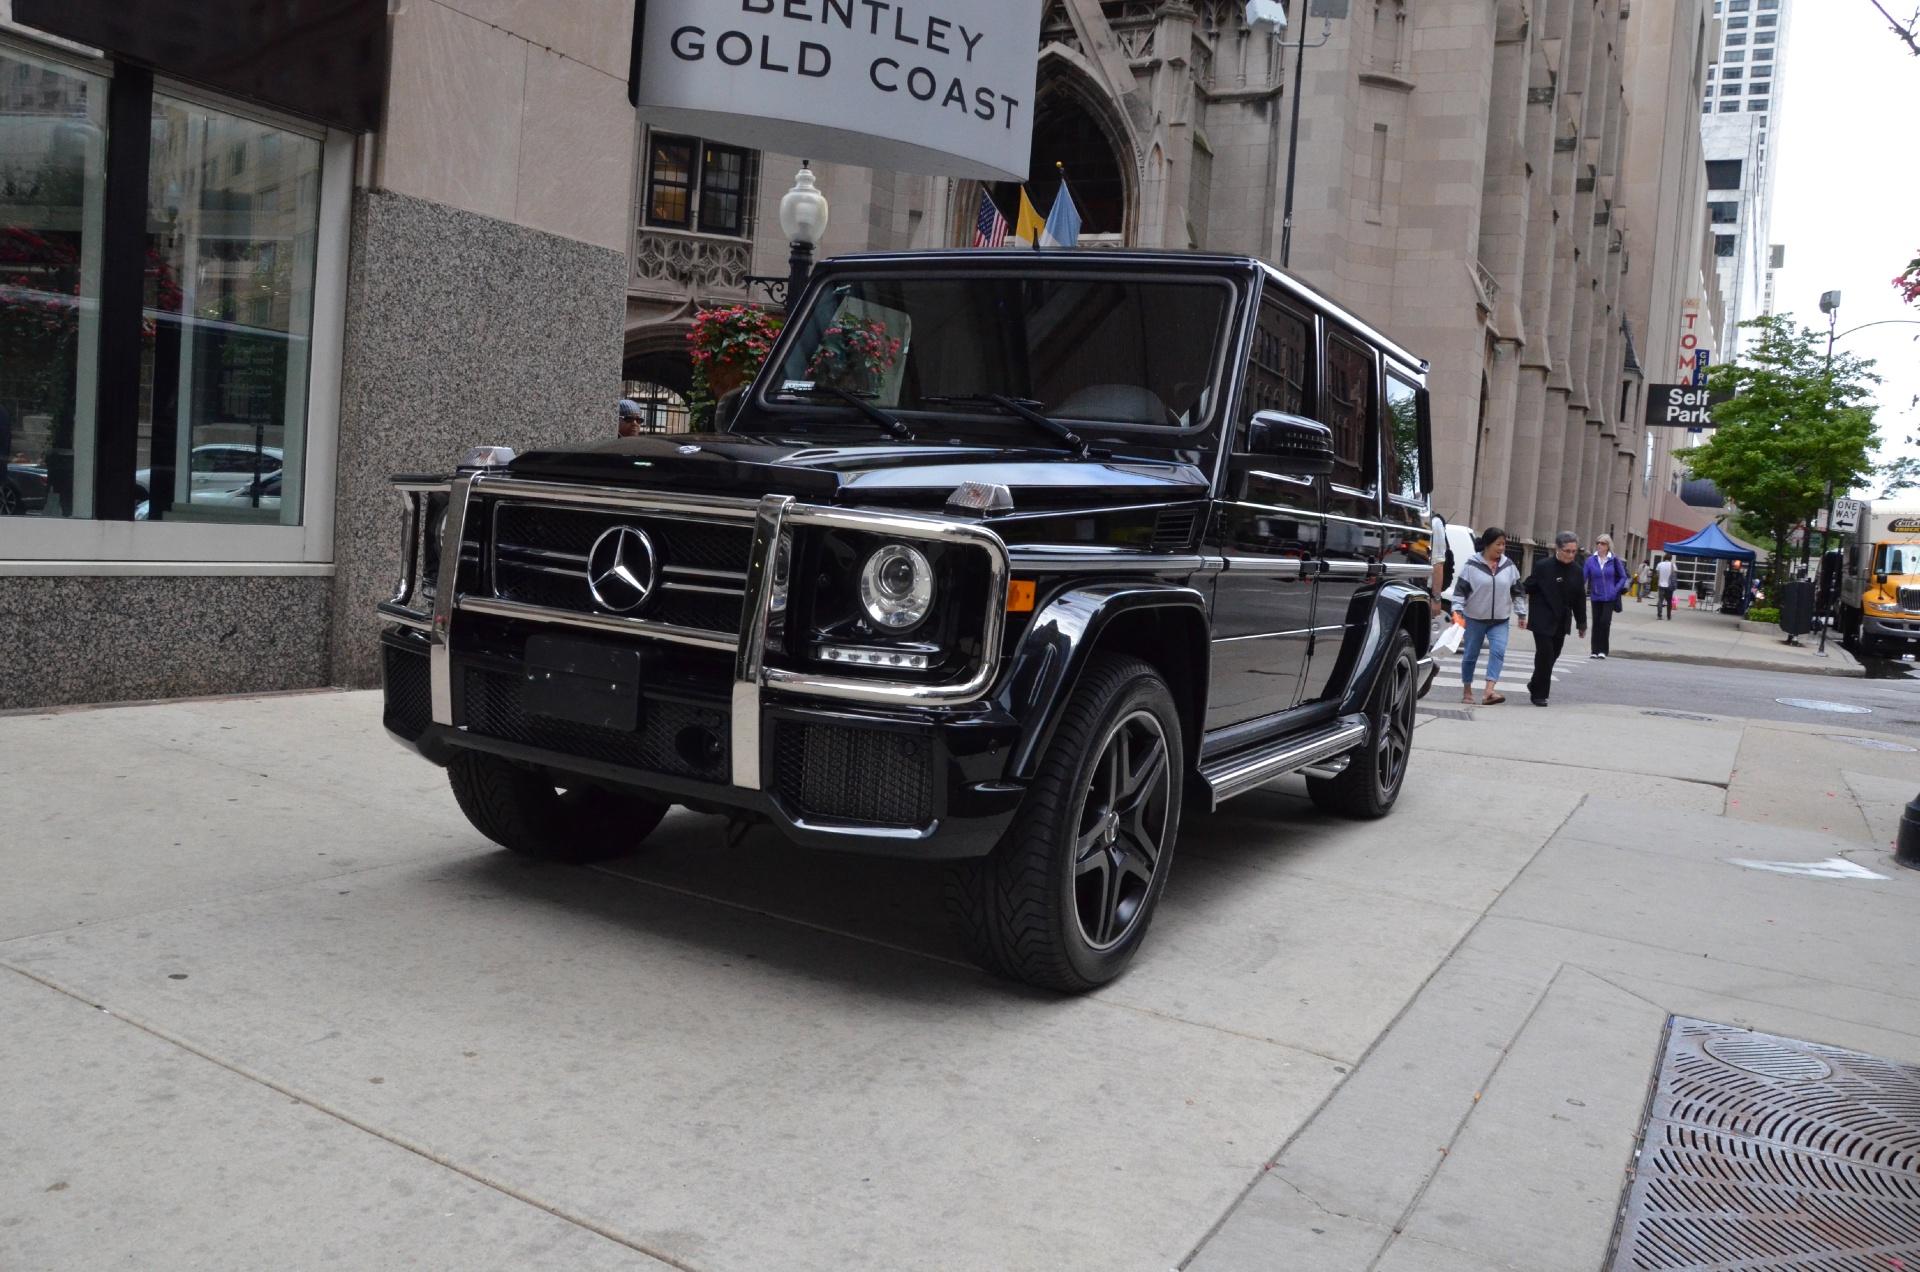 2013 mercedes benz g class g63 amg stock 03221 for sale for Chicago mercedes benz dealer